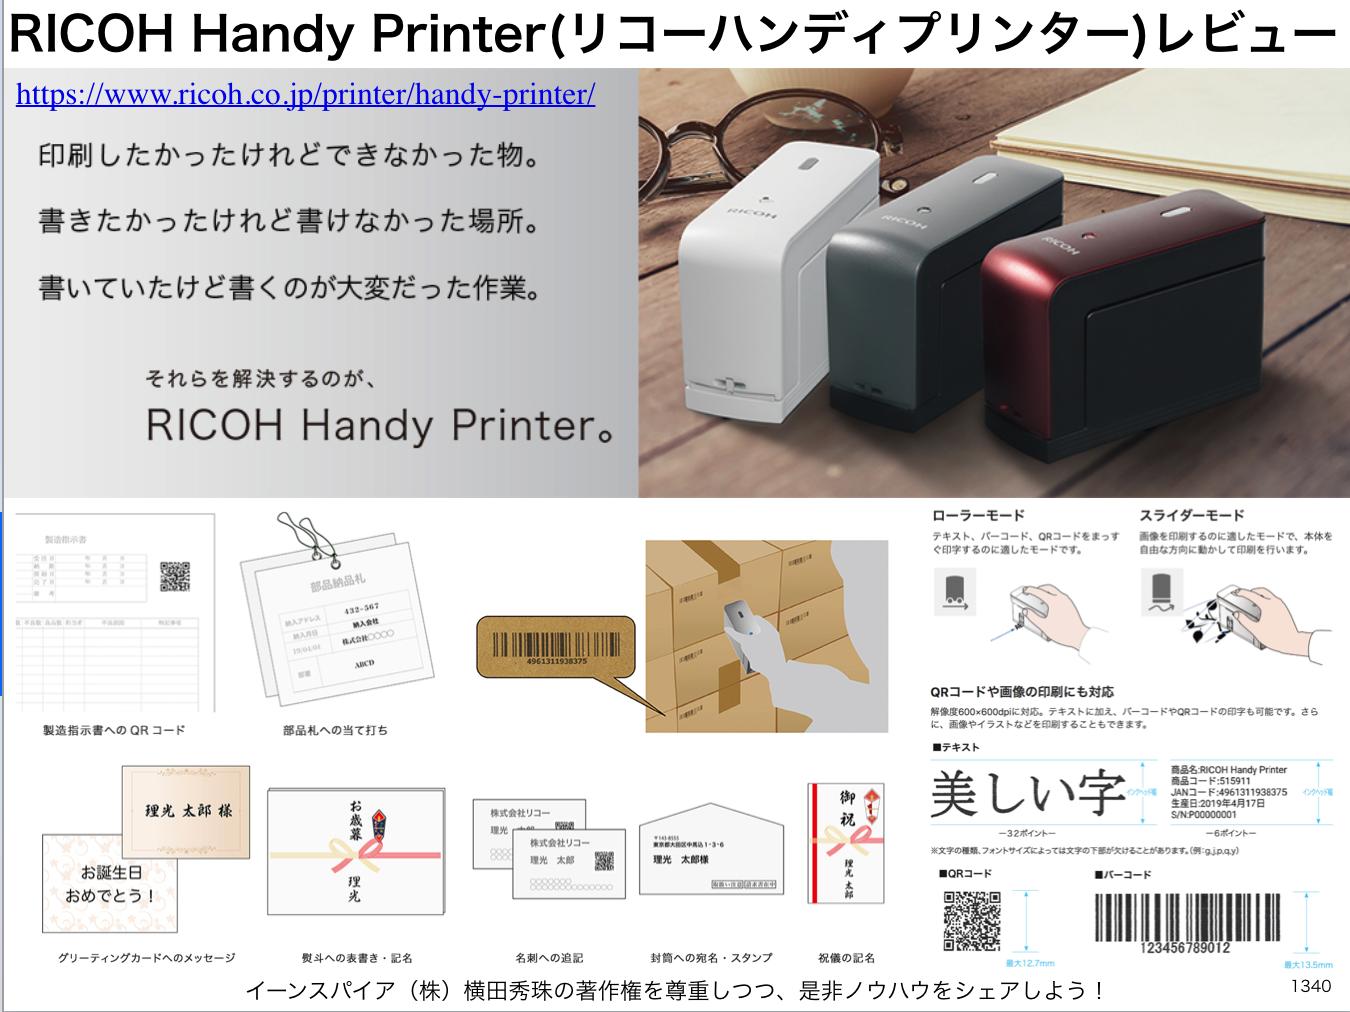 RICOH Handy Printer(リコーハンディプリンター)レビュー